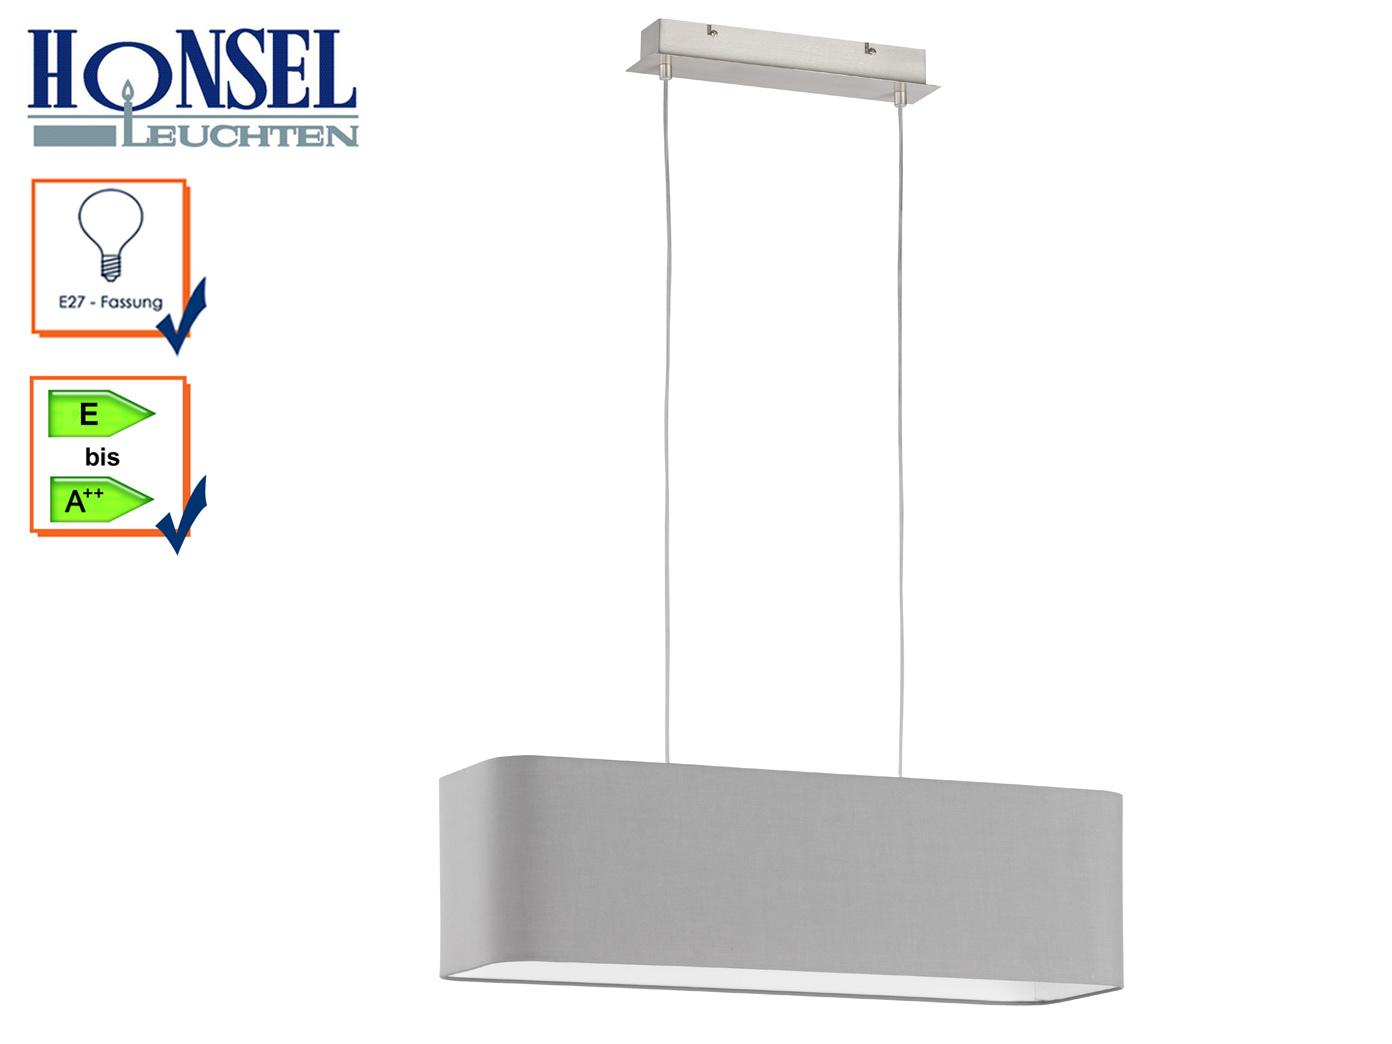 Moderne pendelleuchte stoffschirm 80x25cm grau e27 for Pendelleuchte stoffschirm